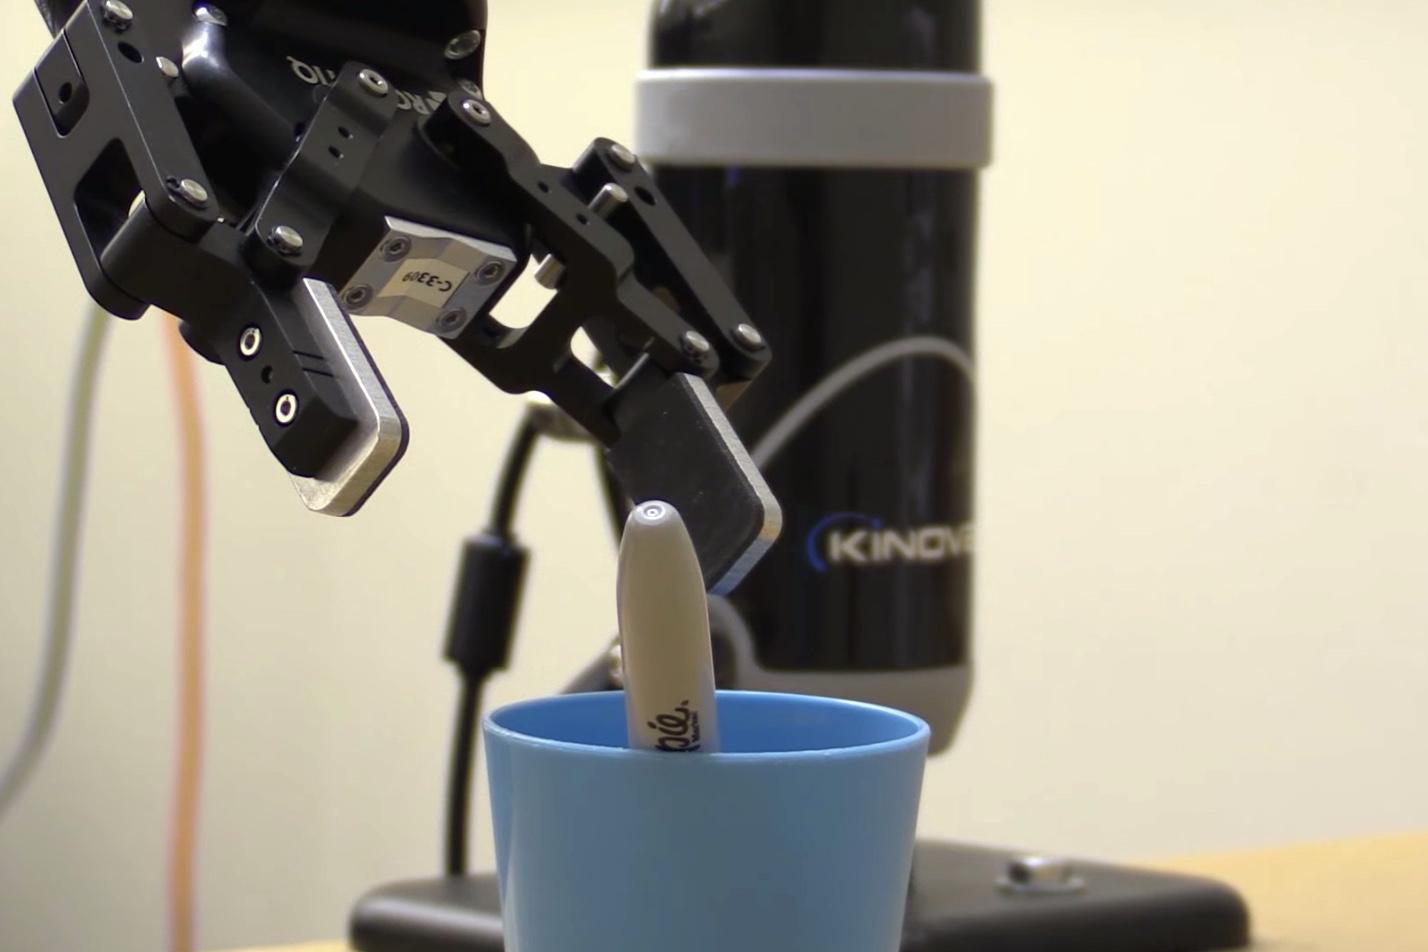 This new method improves robots